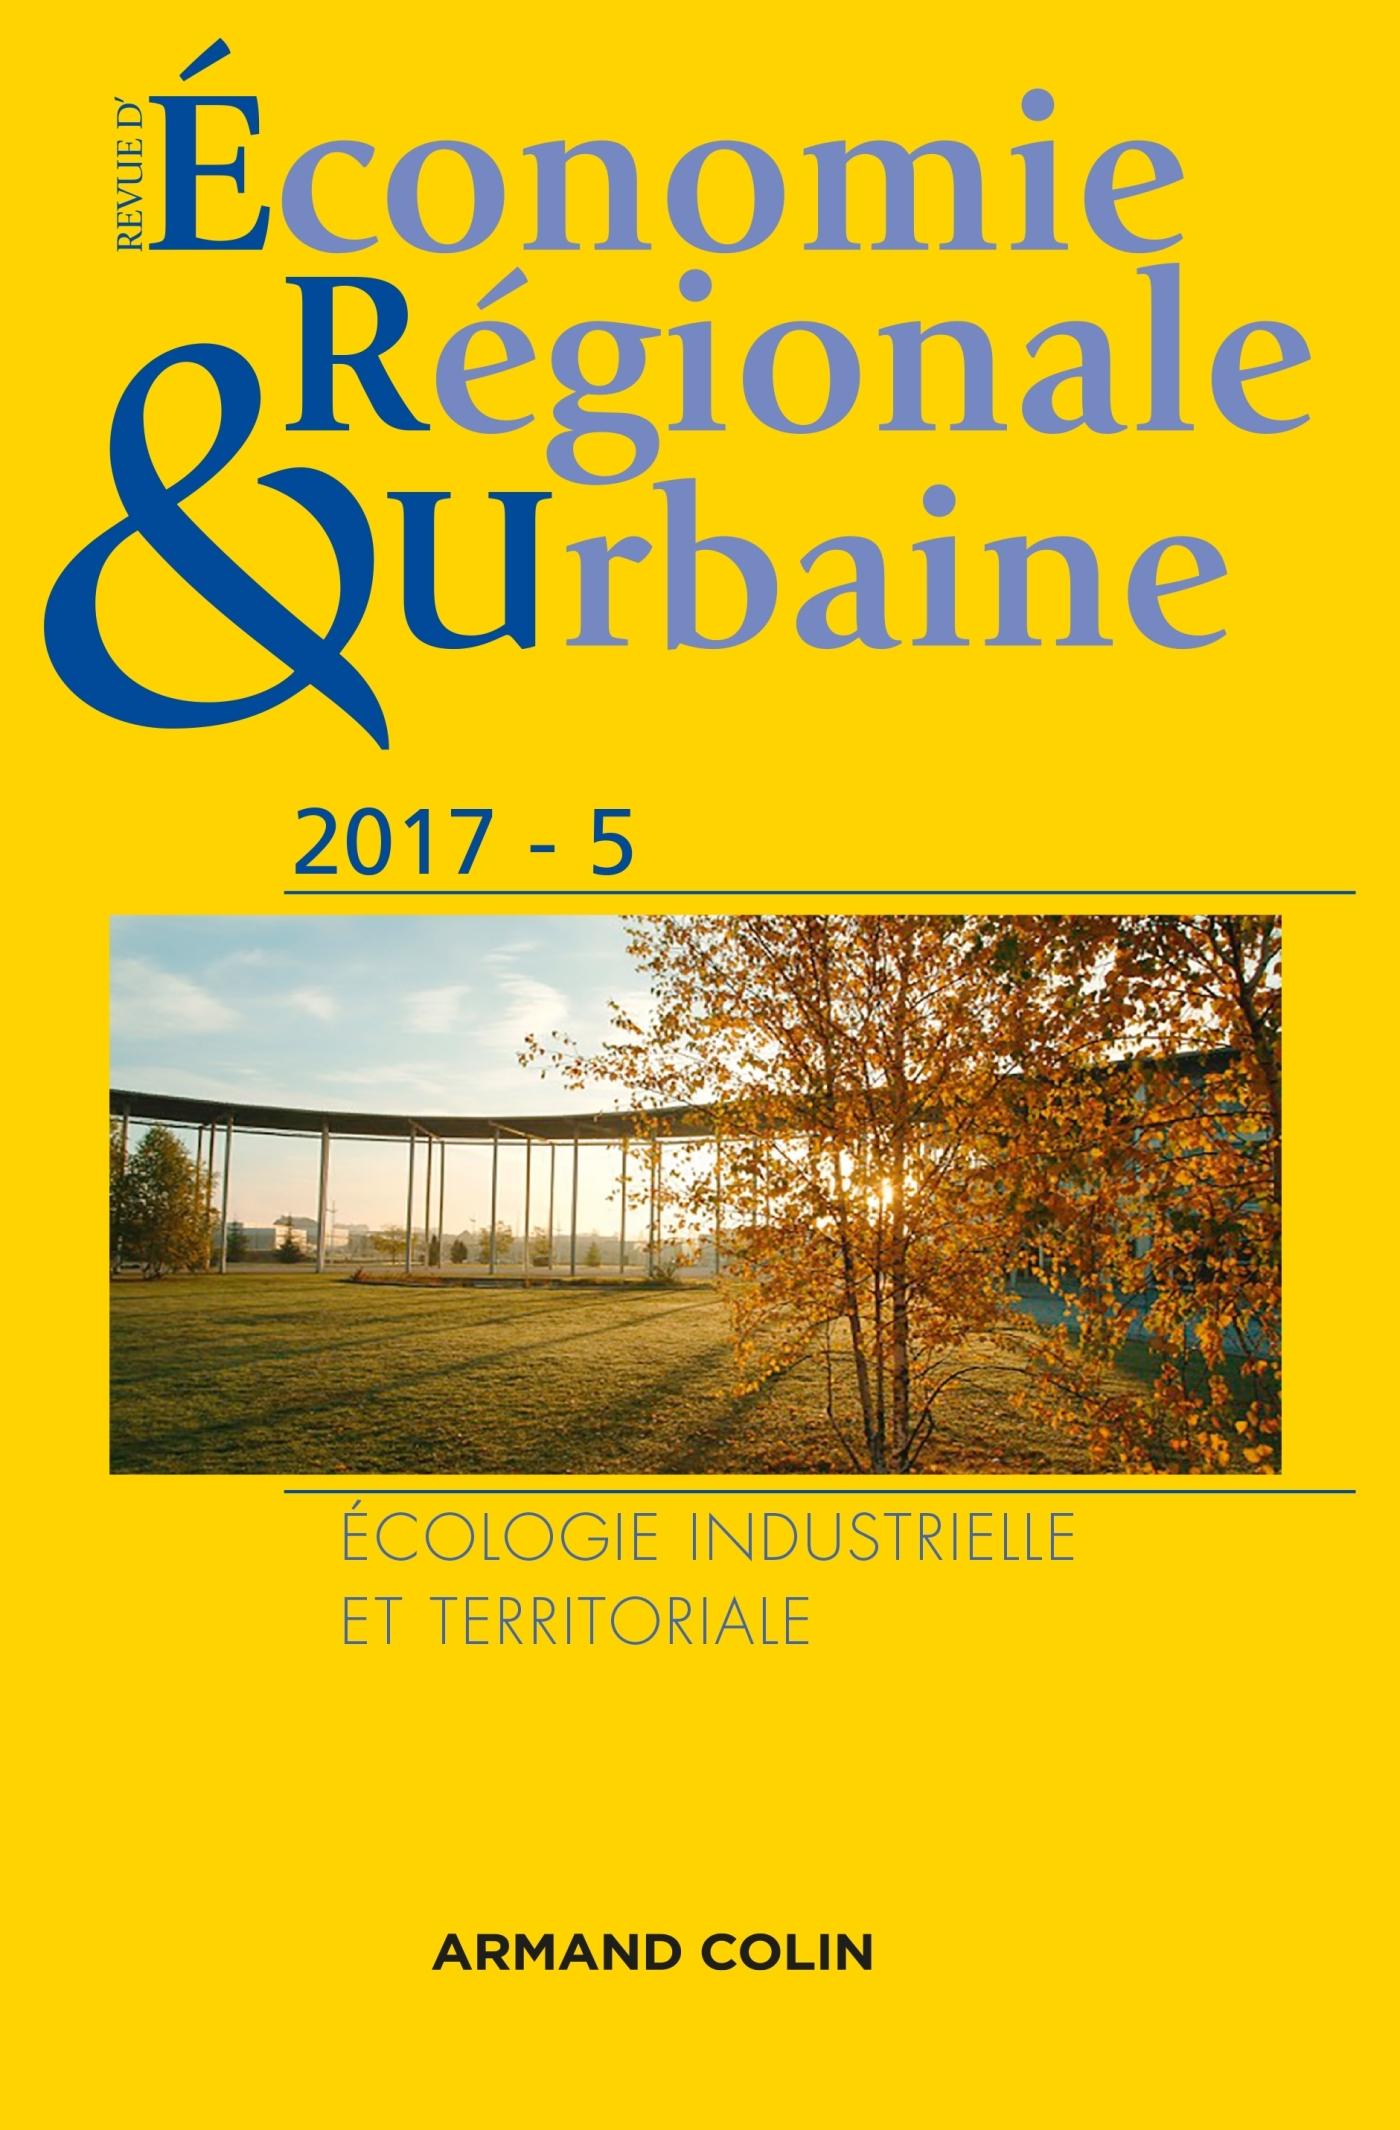 REVUE D'ECONOMIE REGIONALE ET URBAINE N  5/2017 ECOLOGIE INDUSTRIELLE ET TERRITORIALE